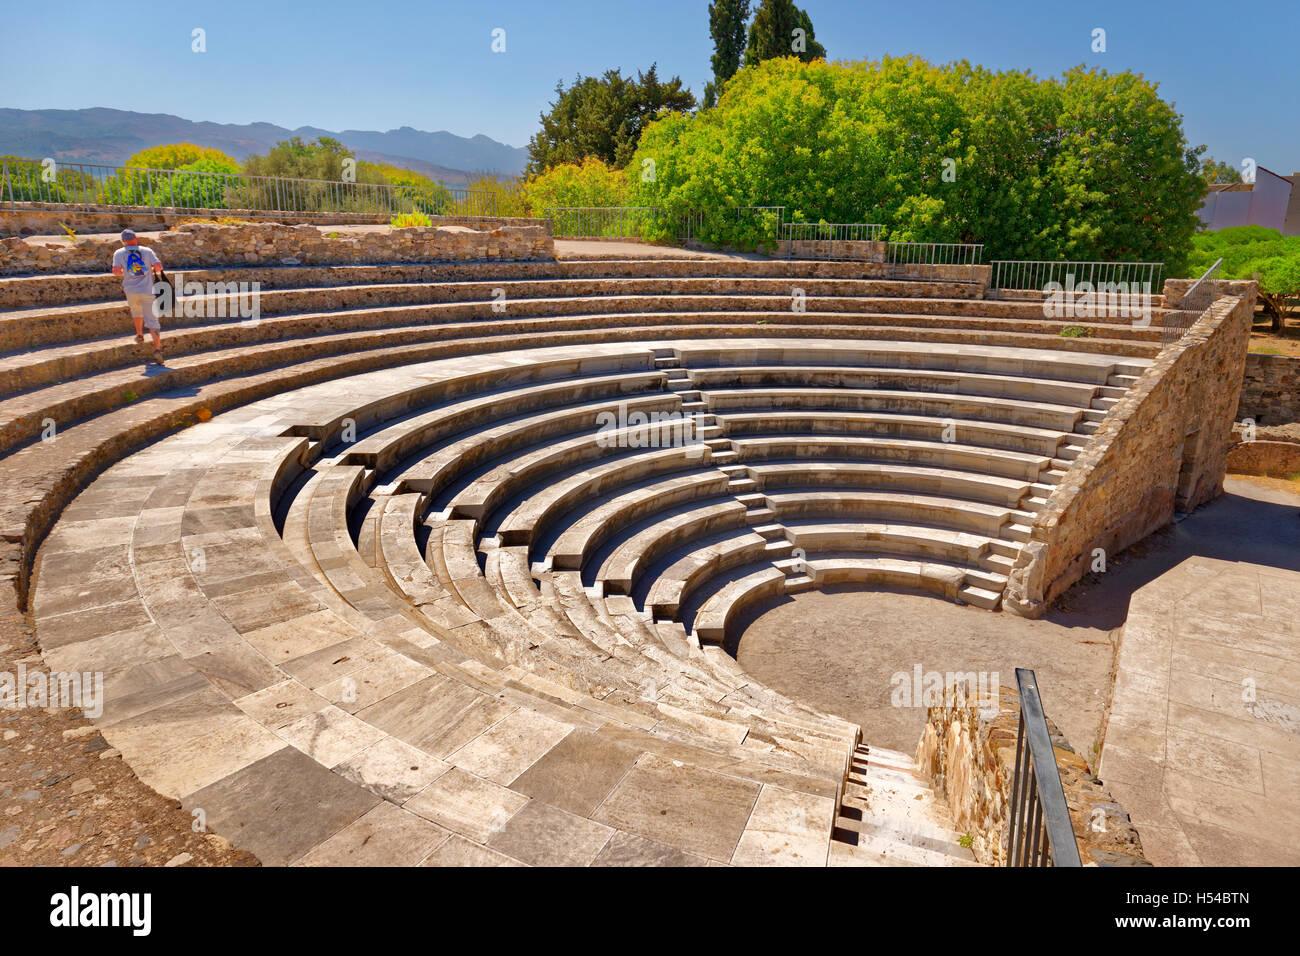 Odeon roman ampitheatre at Kos, Kos Island, Dodecanese Group, Aegean Sea, Greece. - Stock Image